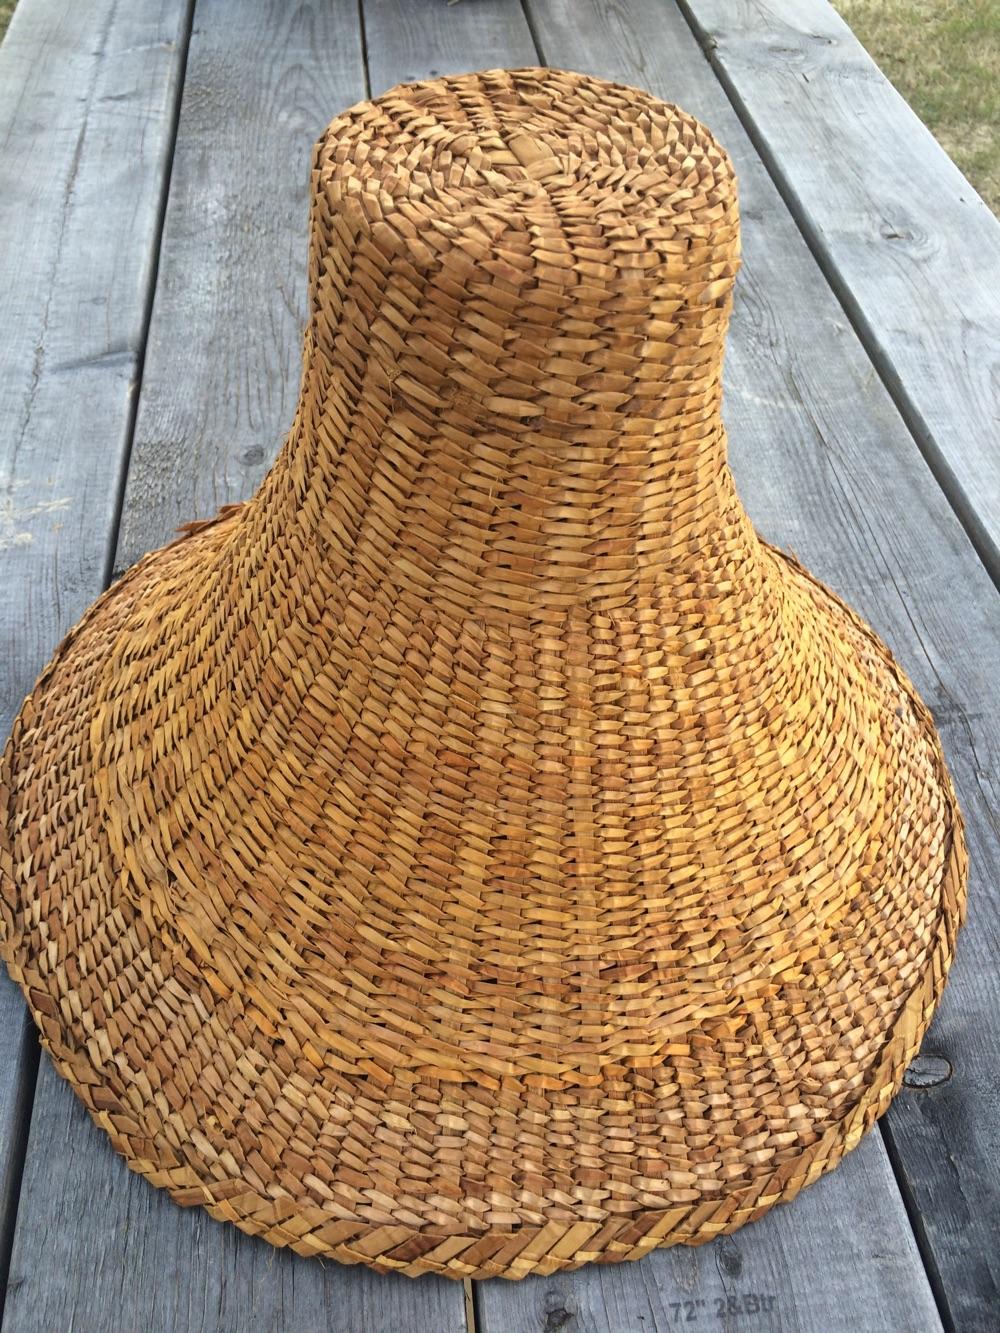 Woven Cedar Hat by Spapium Farm